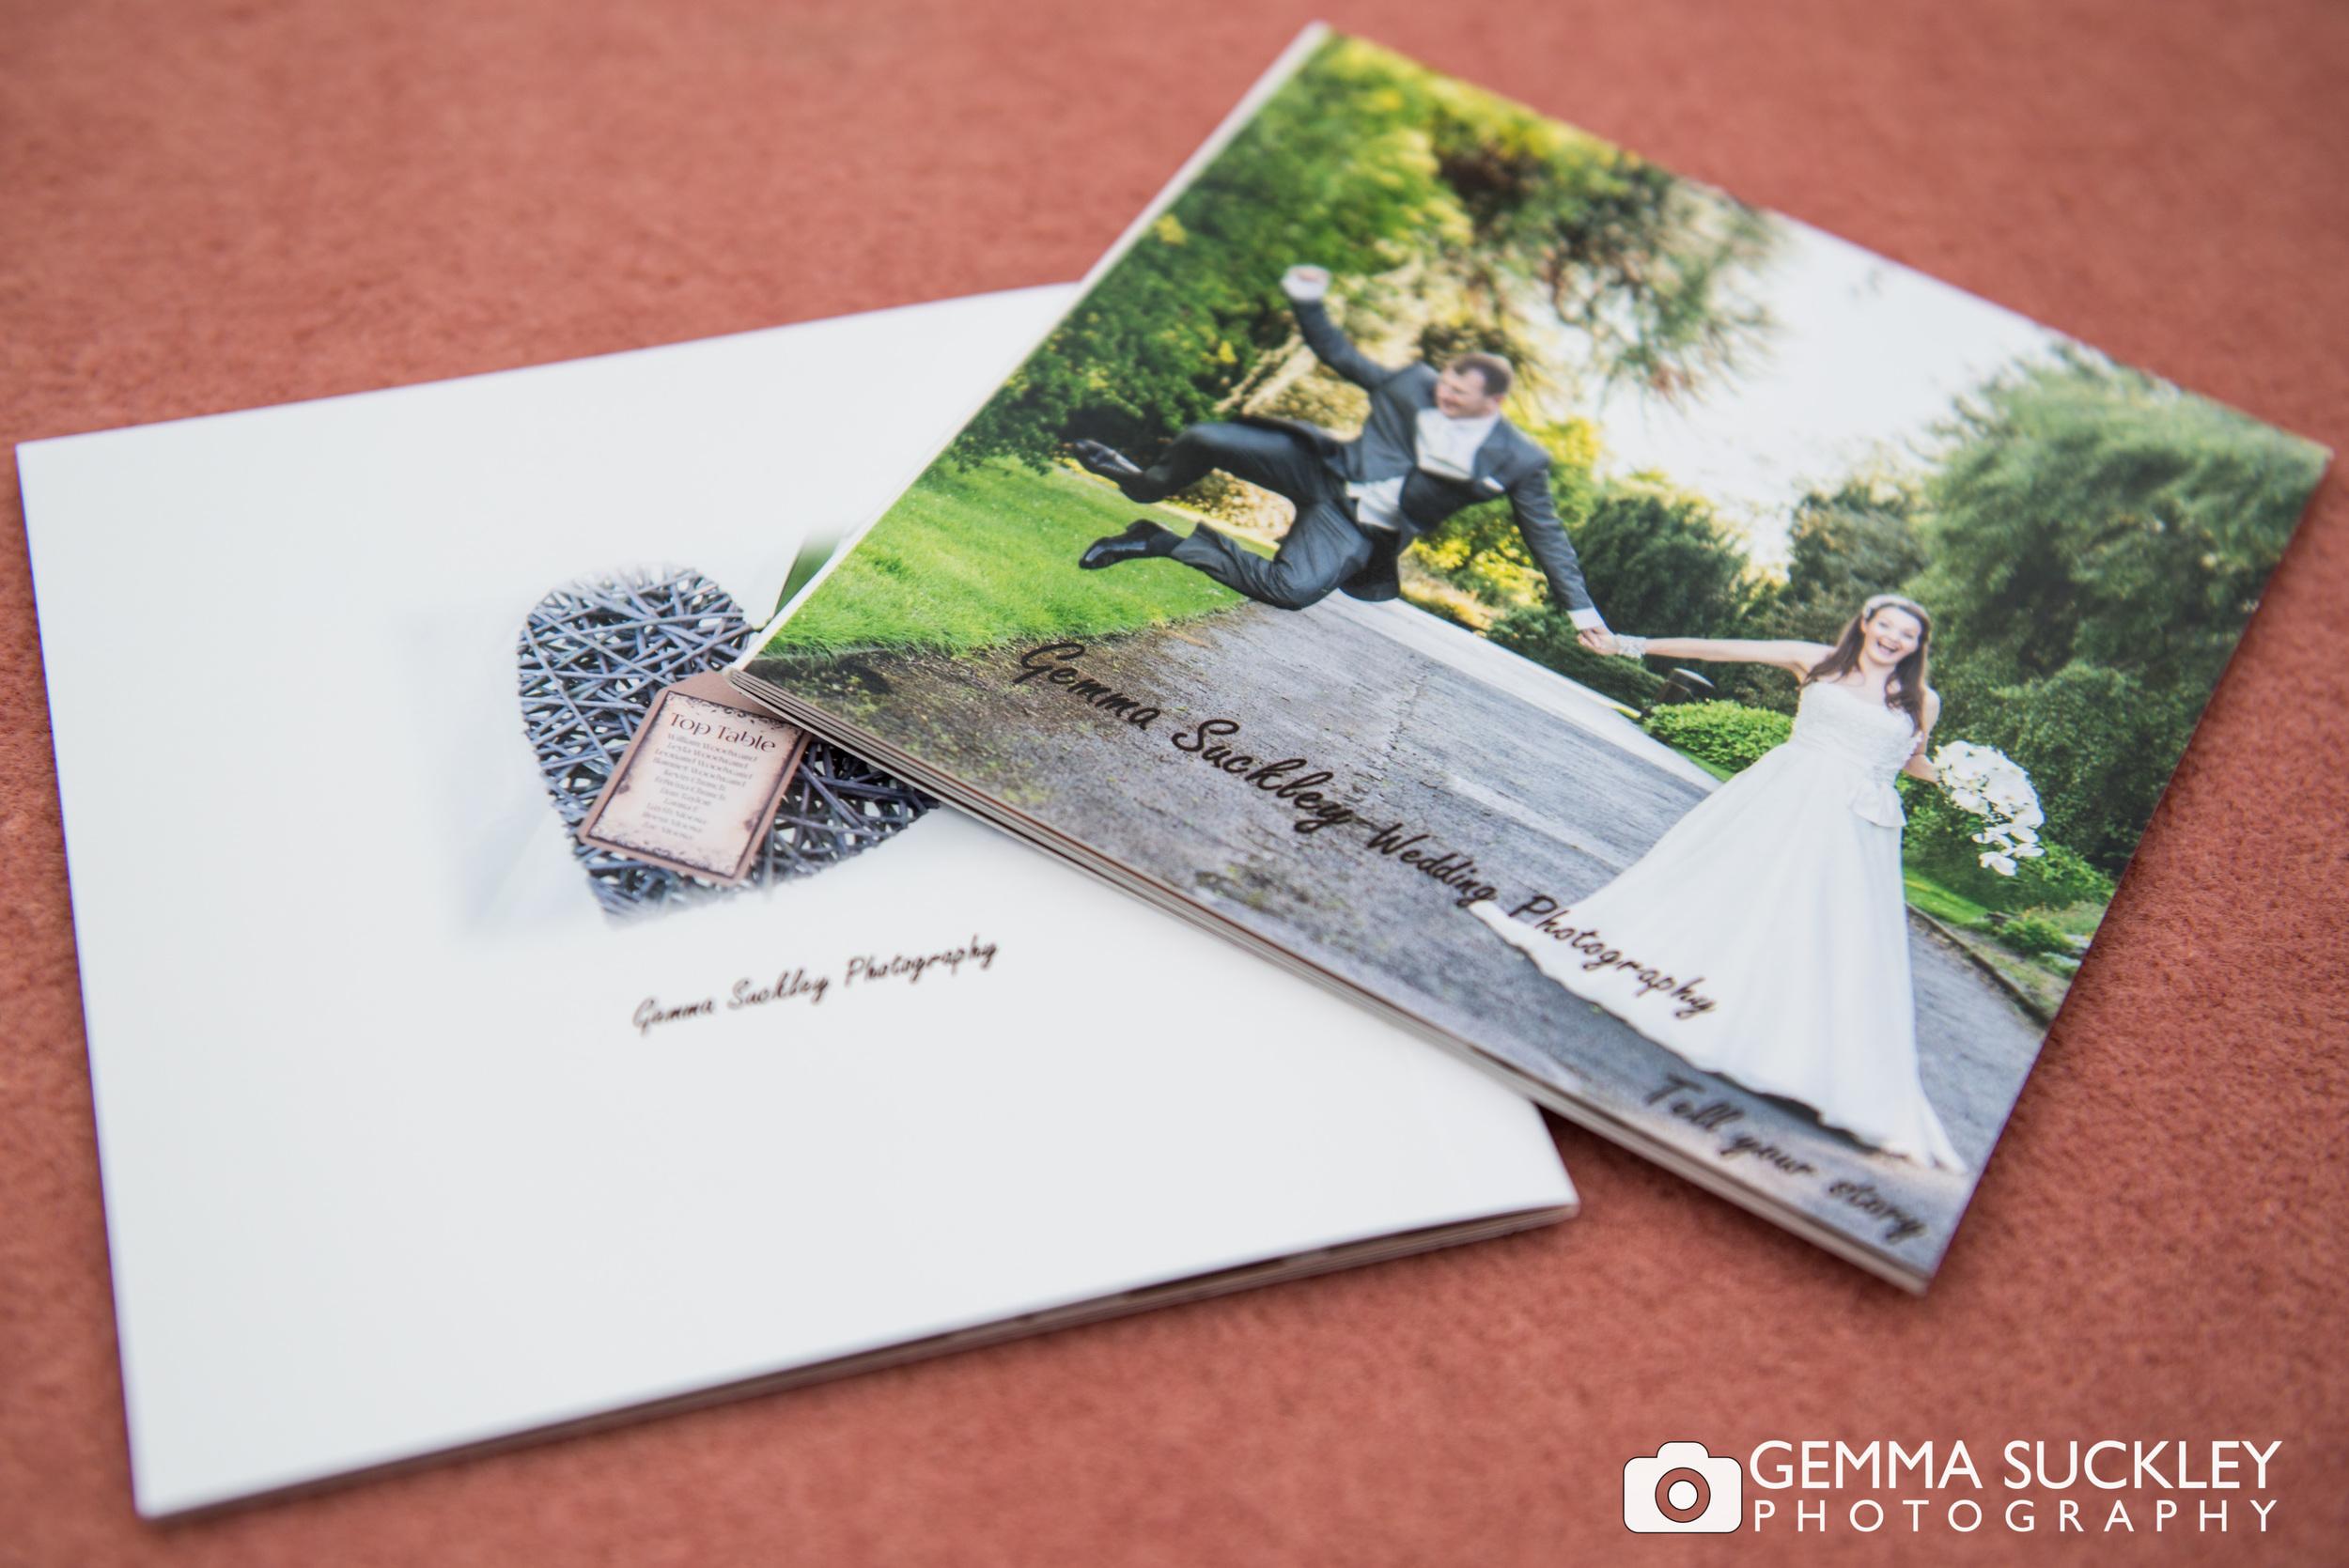 photo-book-gemma-suckley-photography.jpg